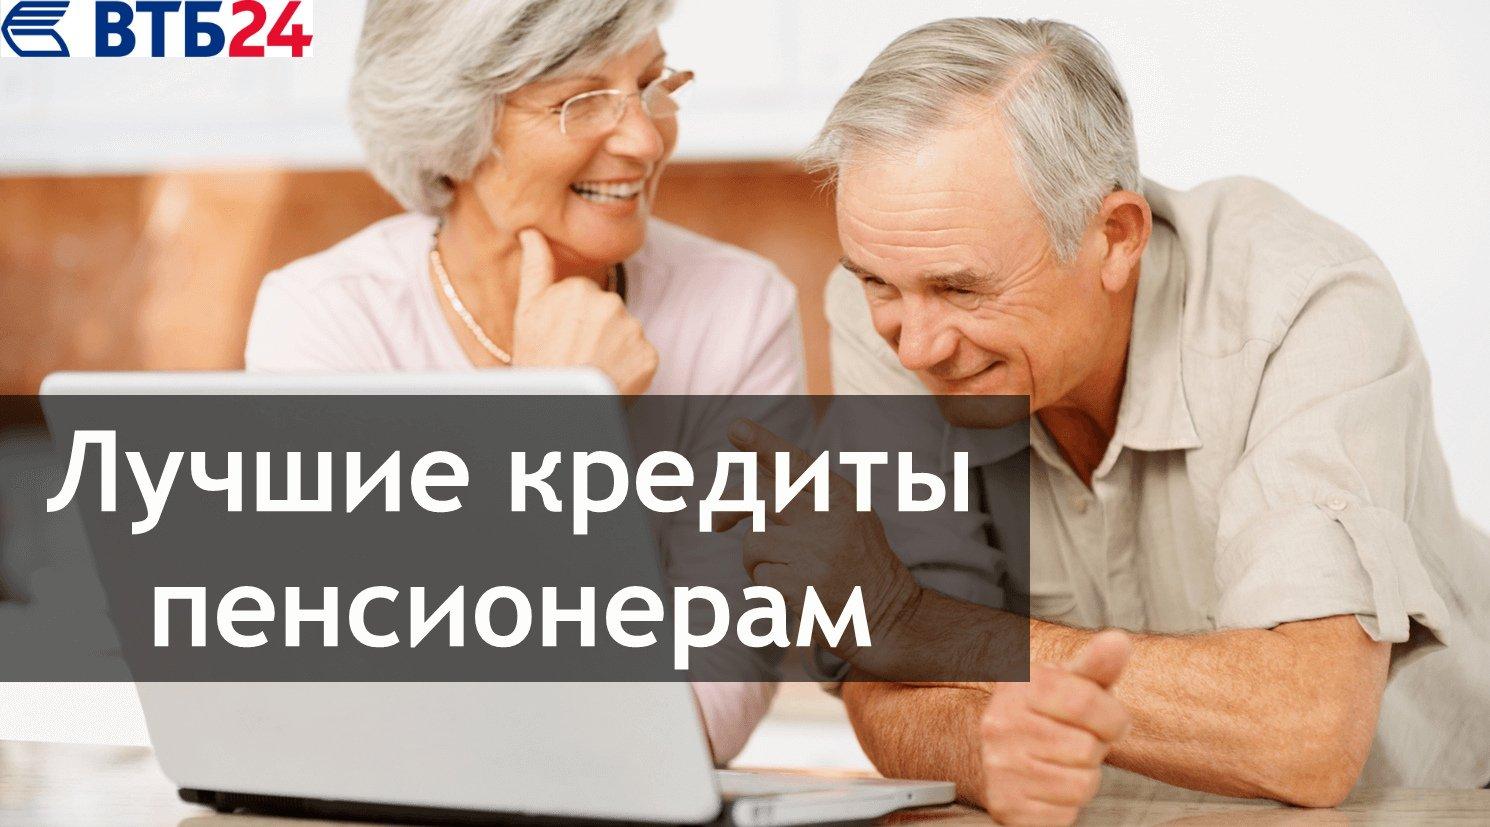 ВТБ кредит пенсионерам